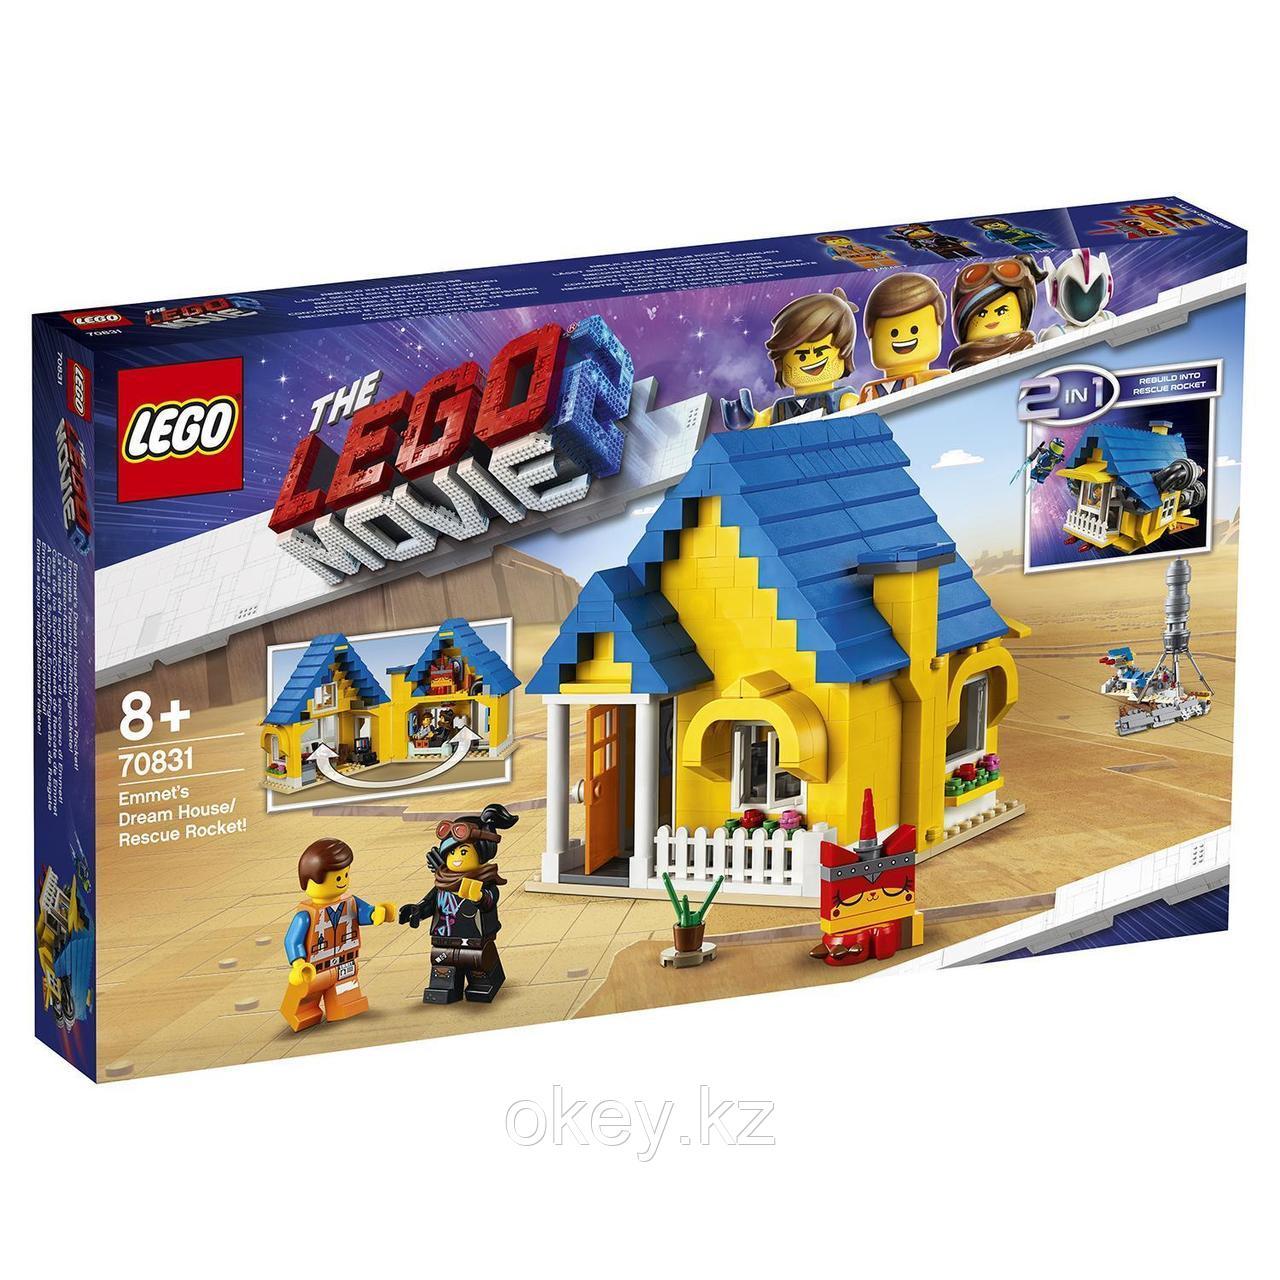 LEGO Movie: Дом мечты Спасательная ракета Эммета! 70831